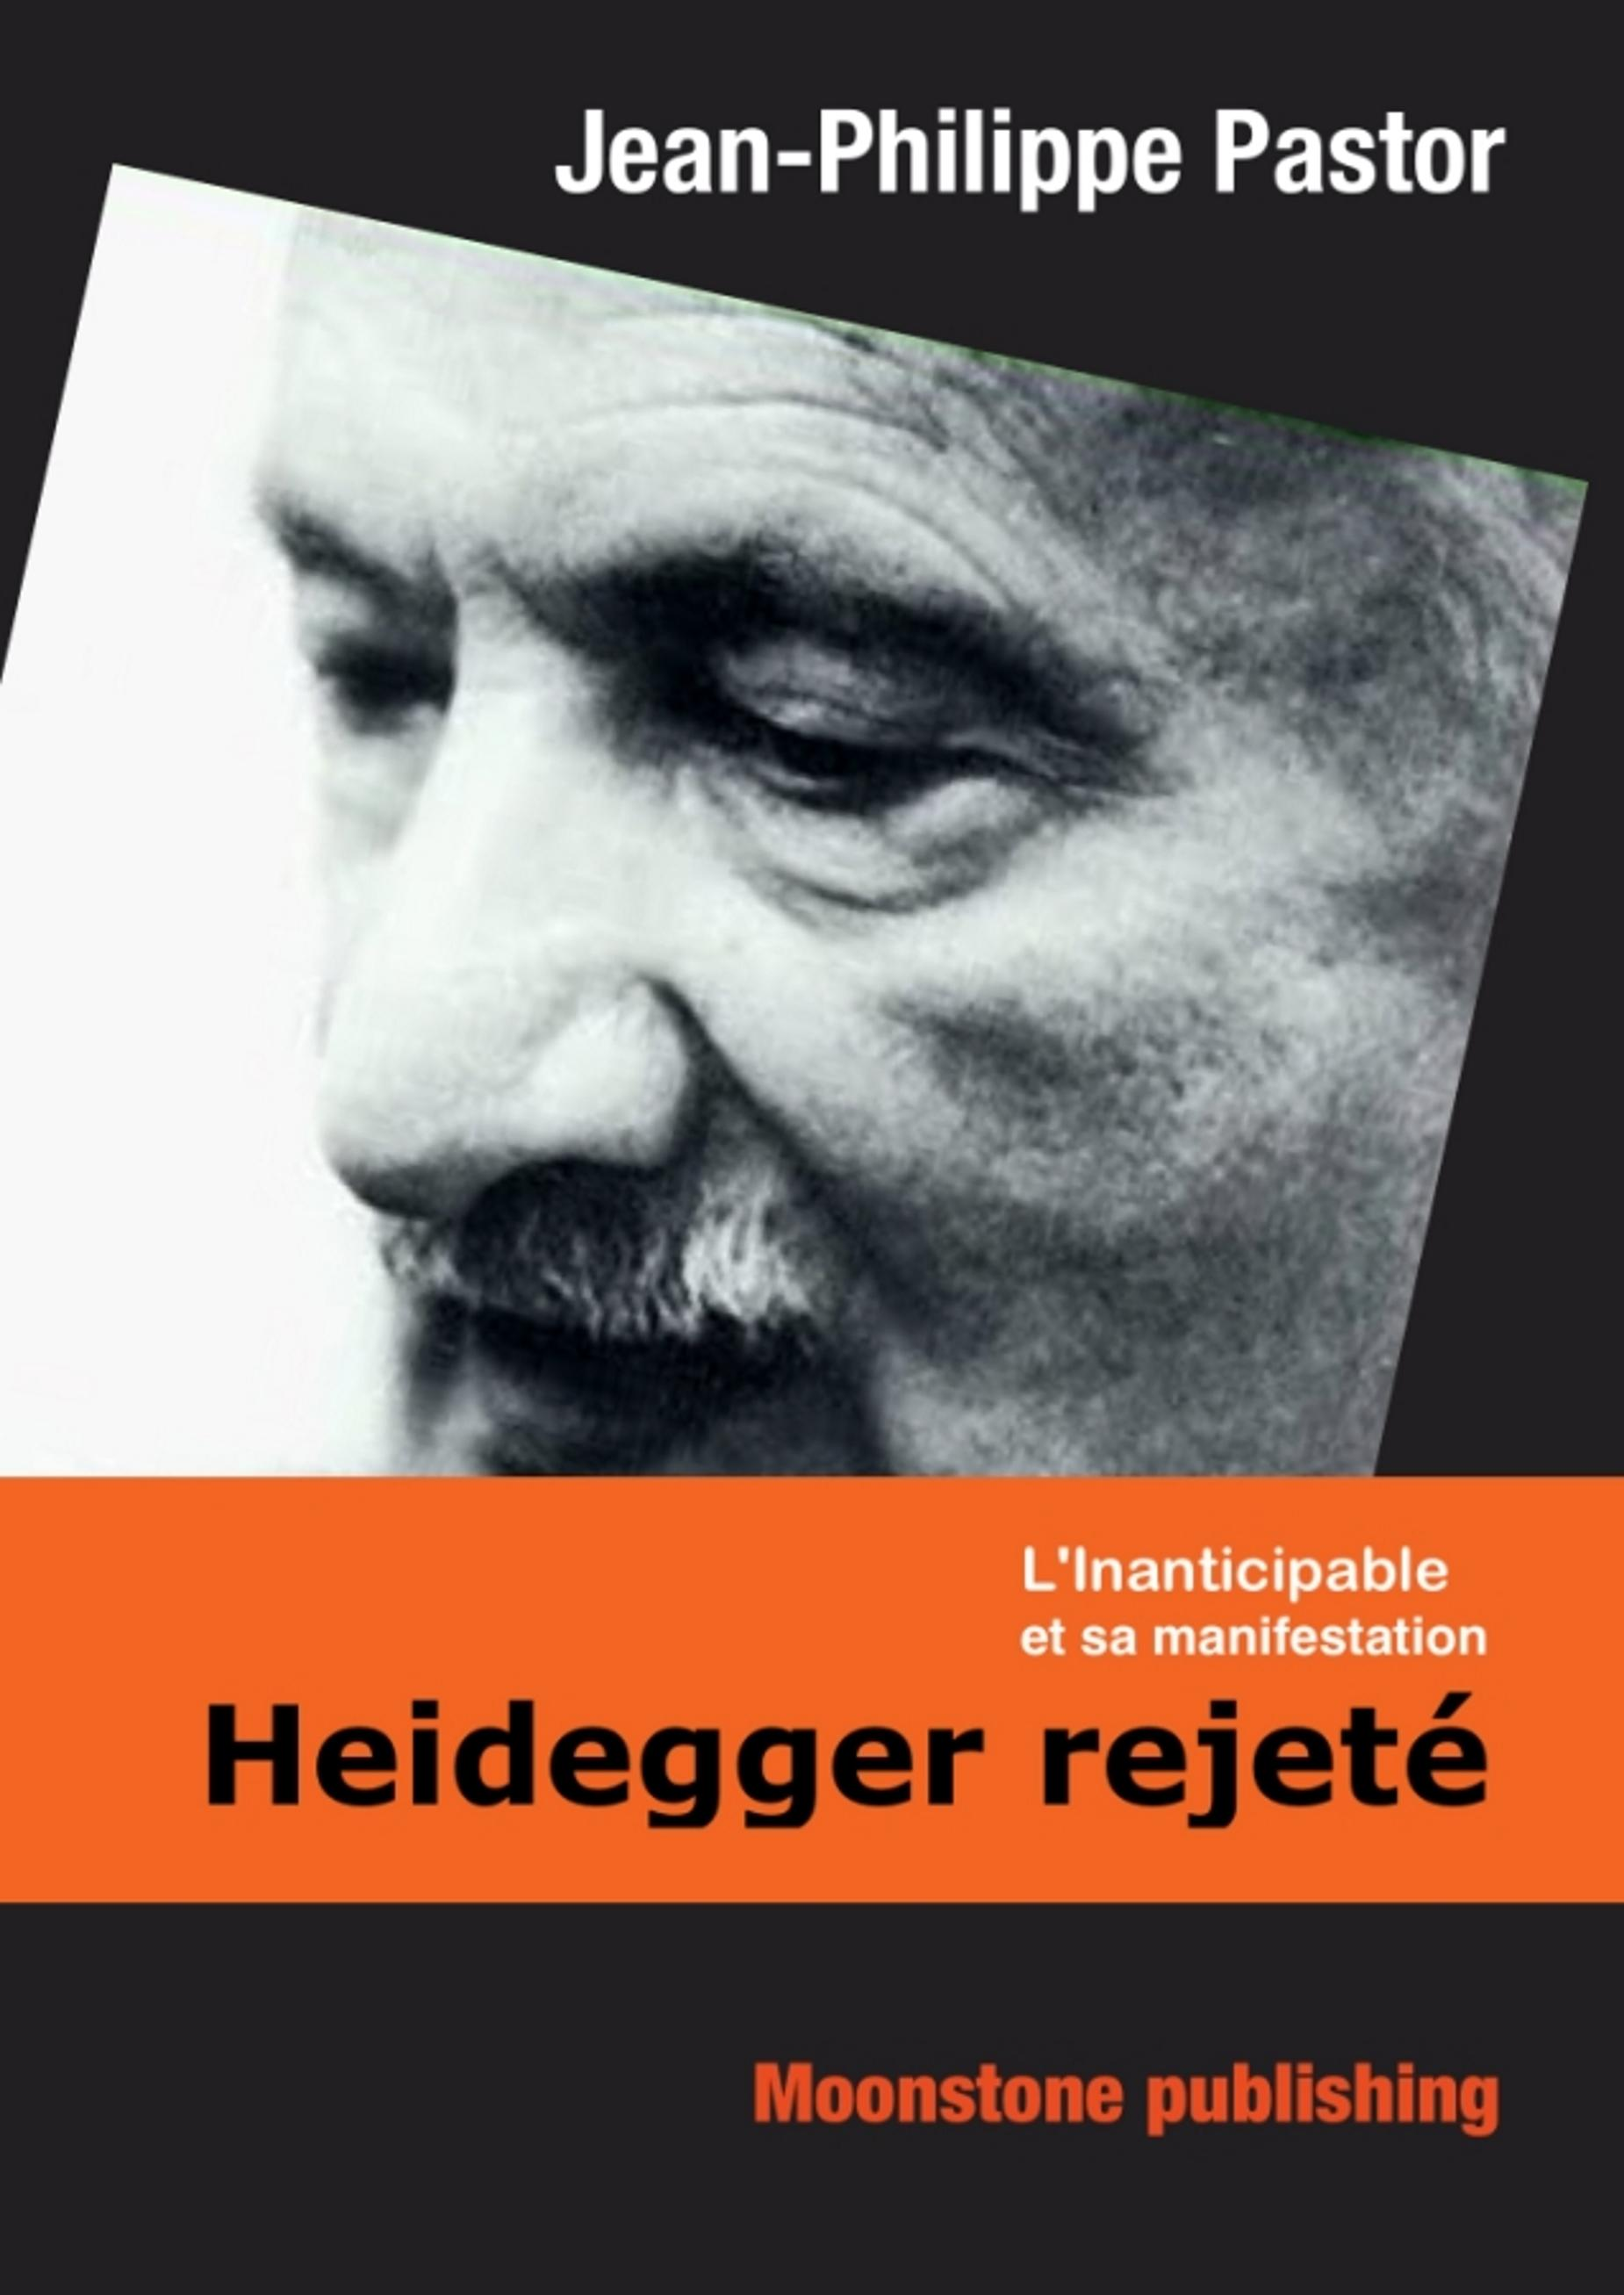 Heidegger rejeté, L'INANTICIPABLE ET SA MANIFESTATION